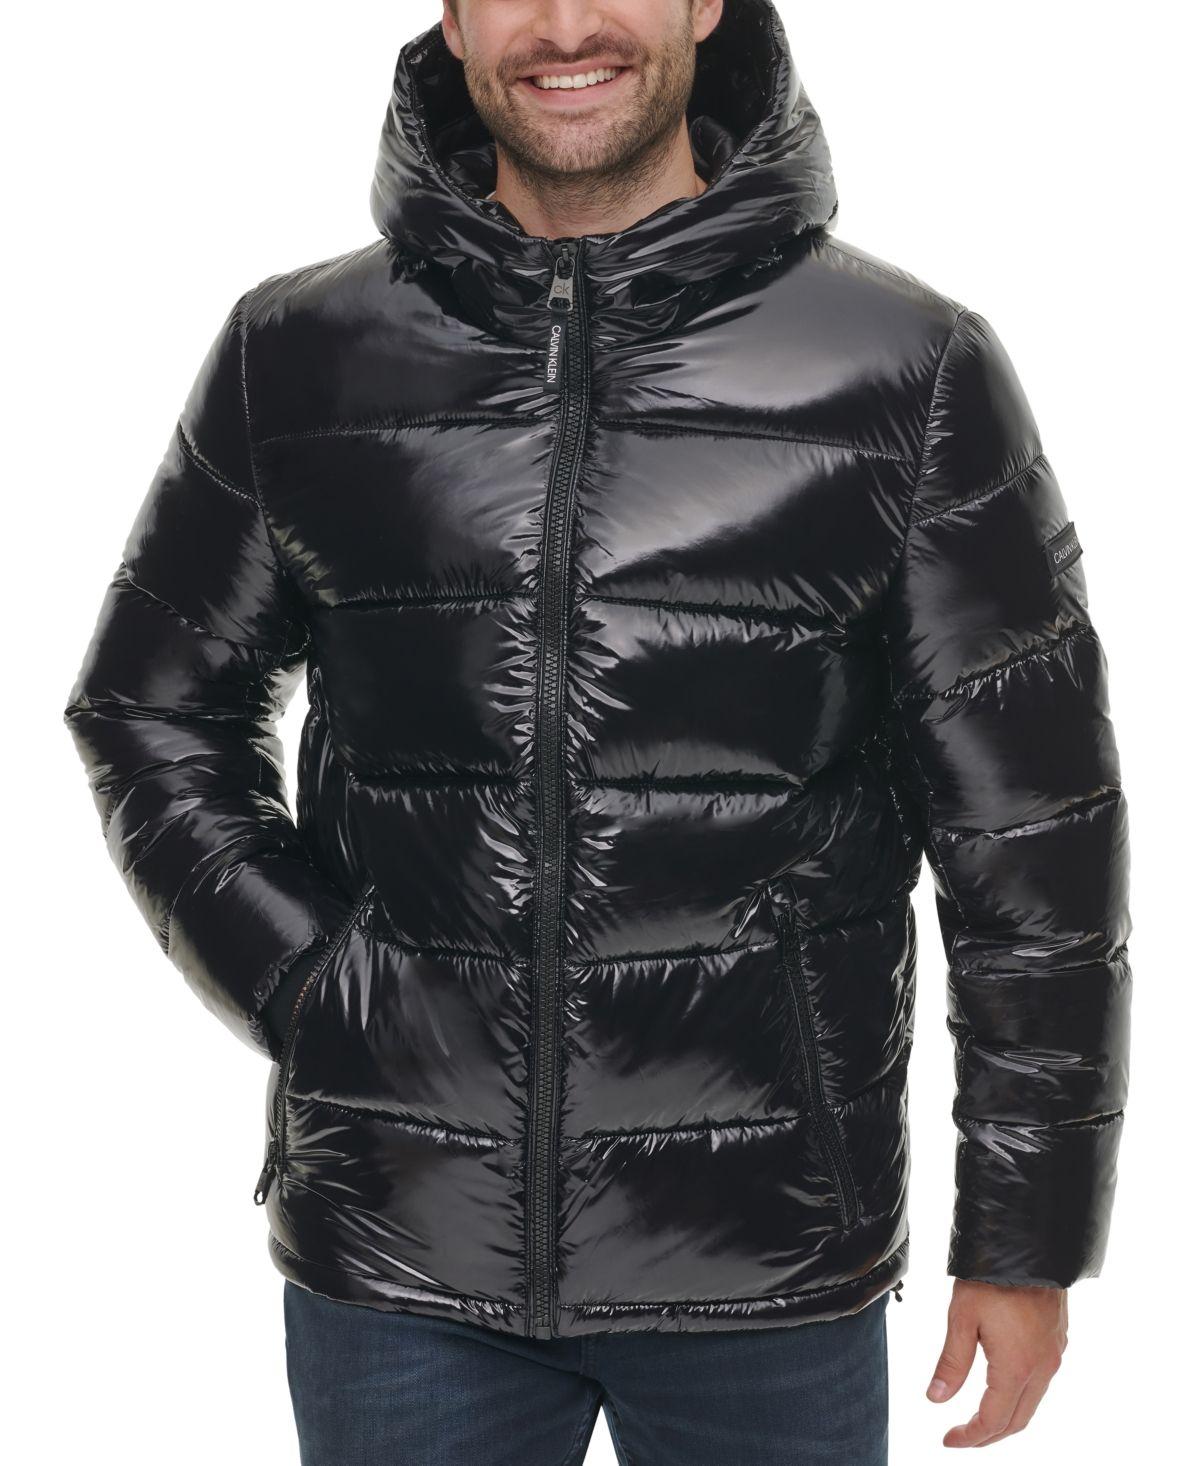 Calvin Klein Men S High Shine Puffer Jacket Reviews Coats Jackets Men Macy S Swag Outfits Men Calvin Klein Men Puffer Jackets [ 1466 x 1200 Pixel ]